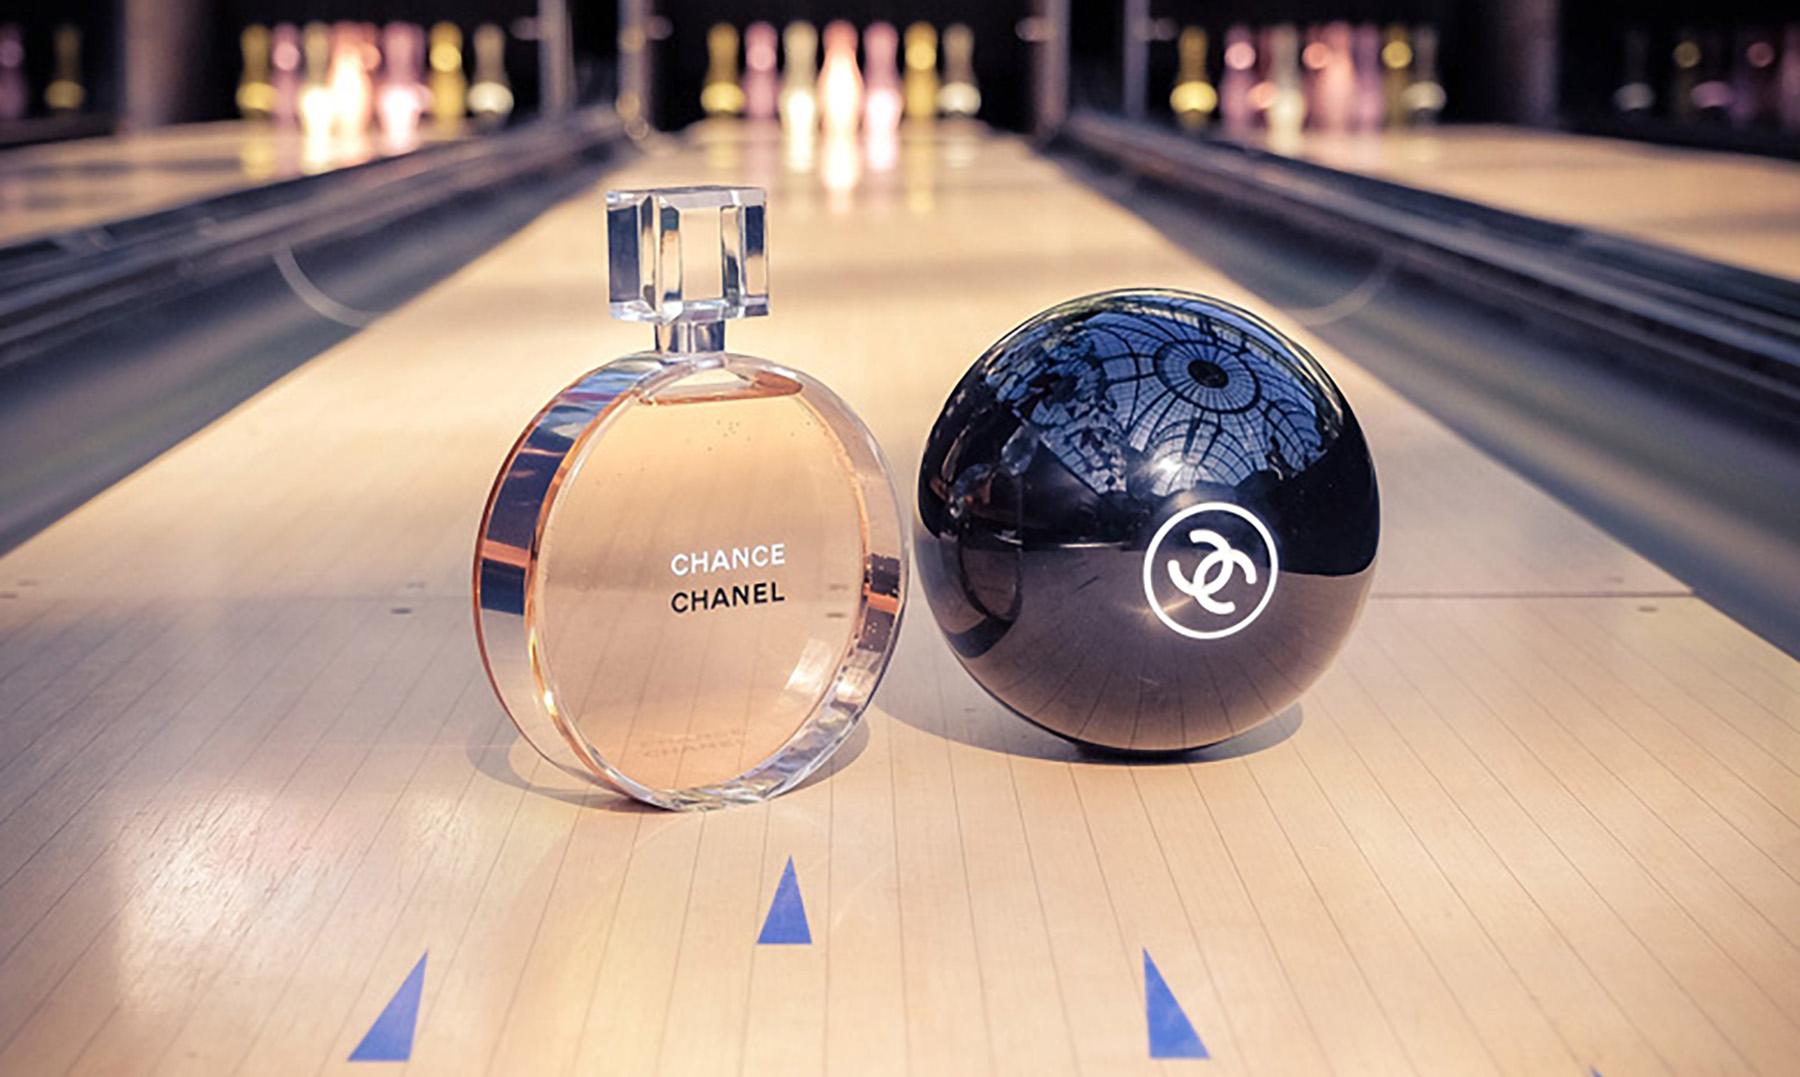 Bowling_chanel_01